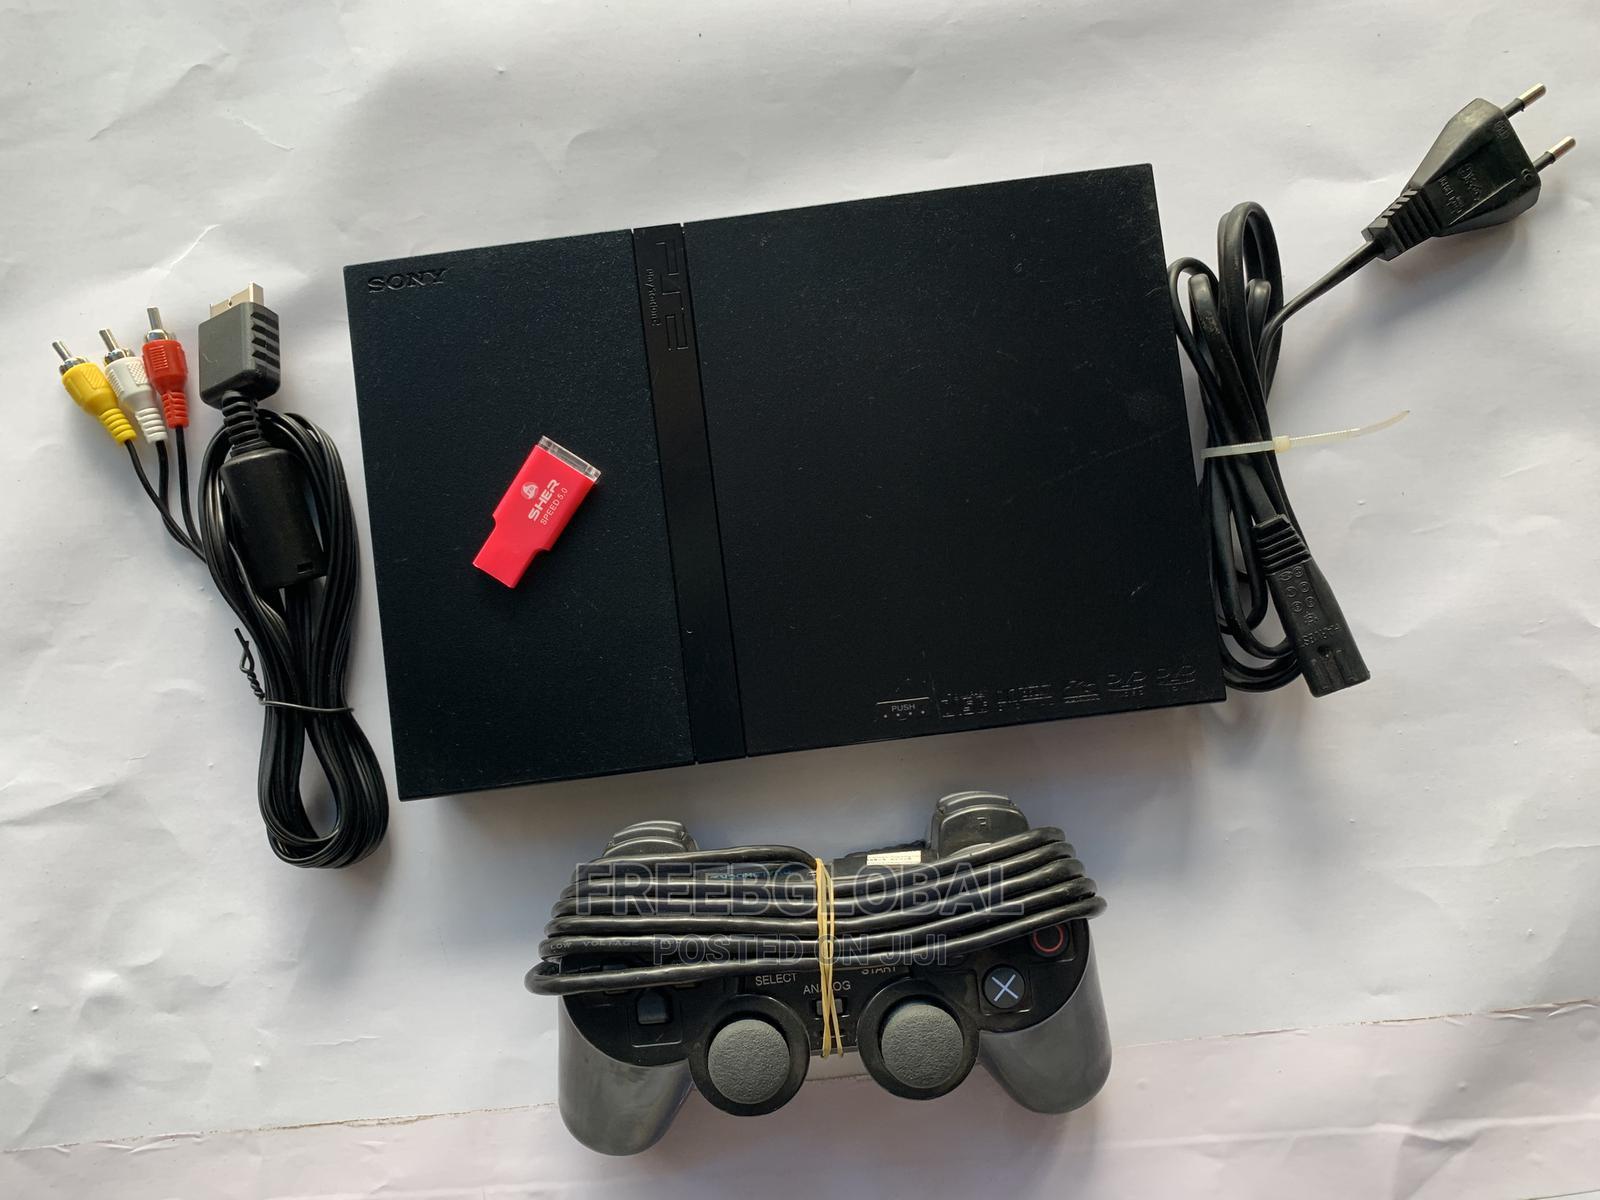 Ps2 Slim ( Playstation 2 Slim) | Video Game Consoles for sale in Agboyi/Ketu, Lagos State, Nigeria